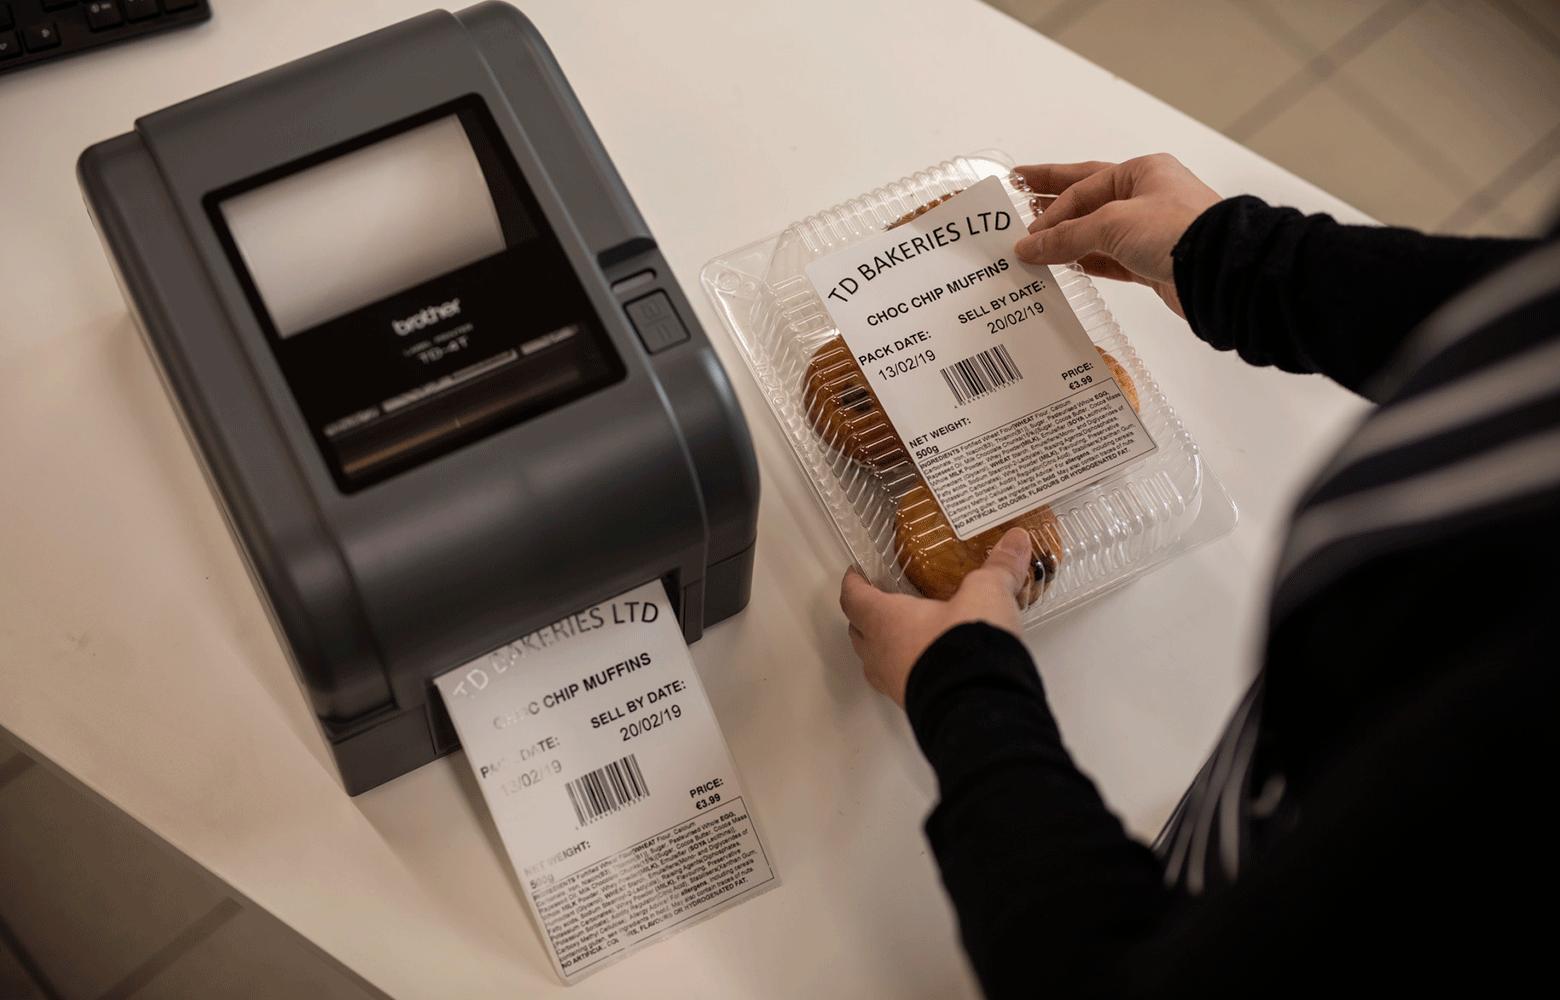 Stampante TD stampa etichetta per scatola di muffin